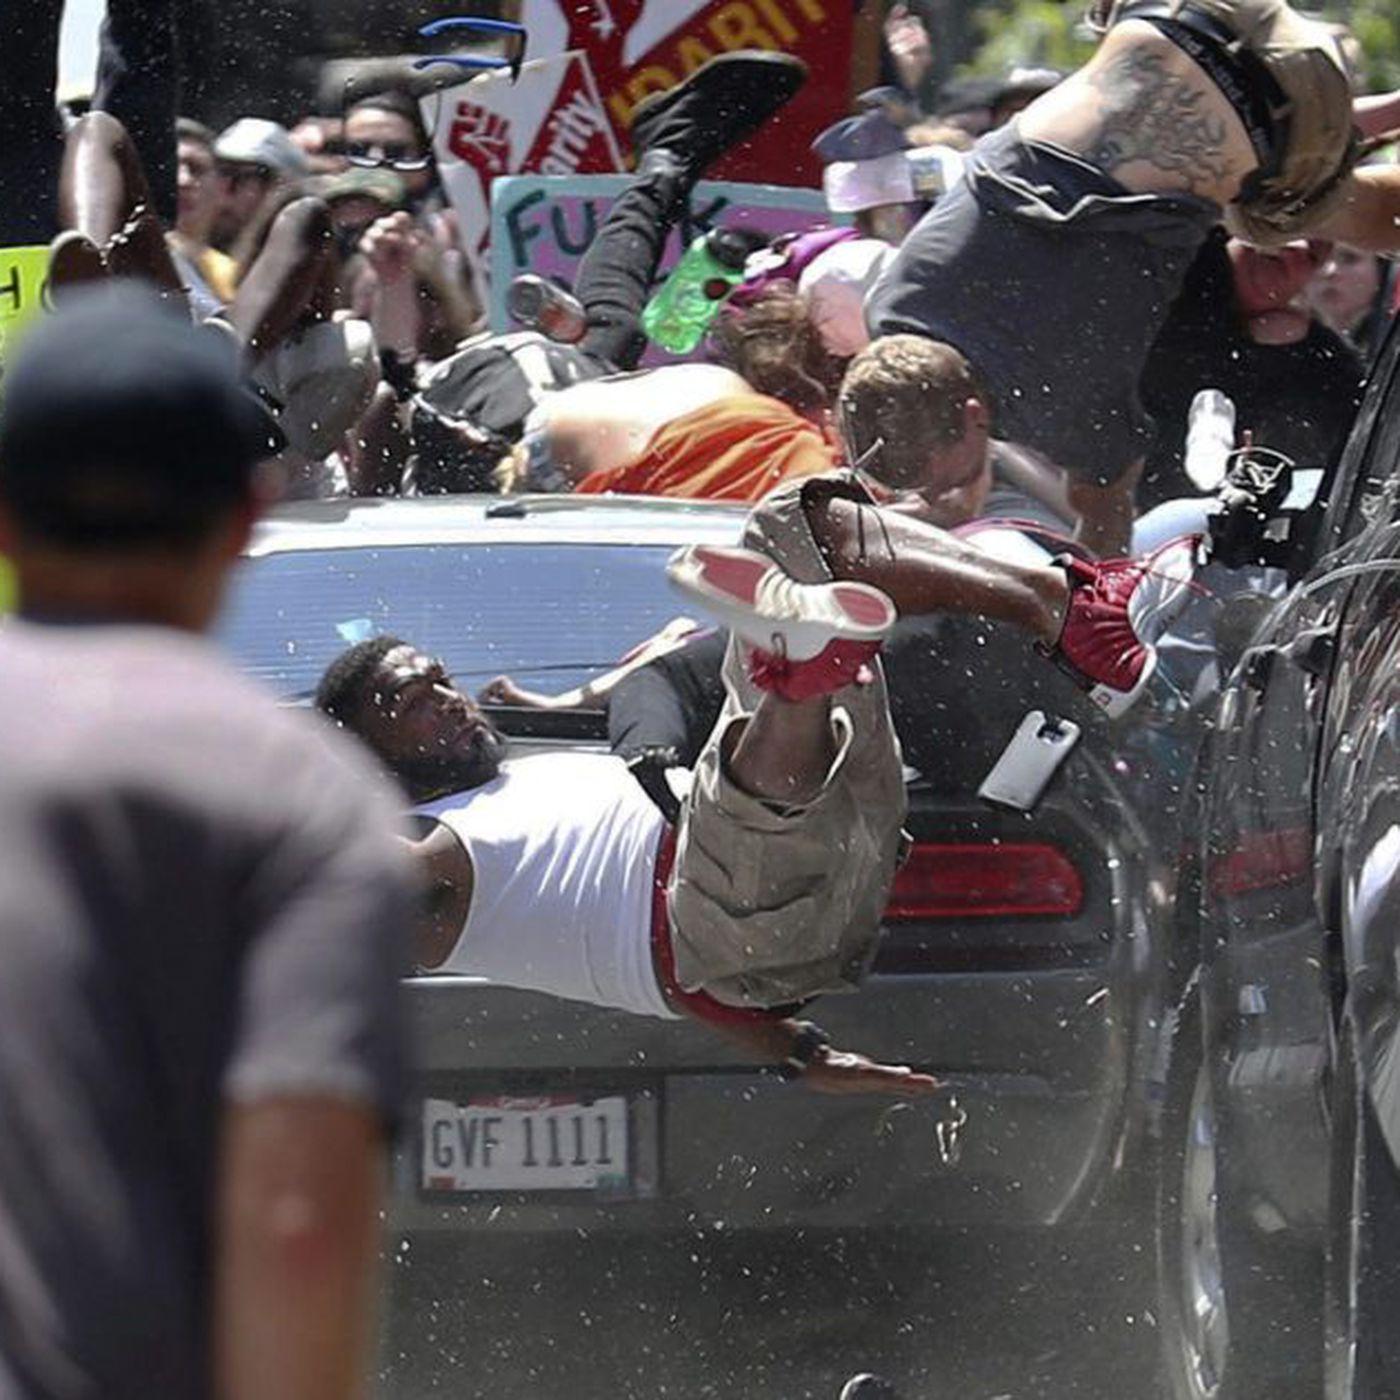 houston protest - photo #1